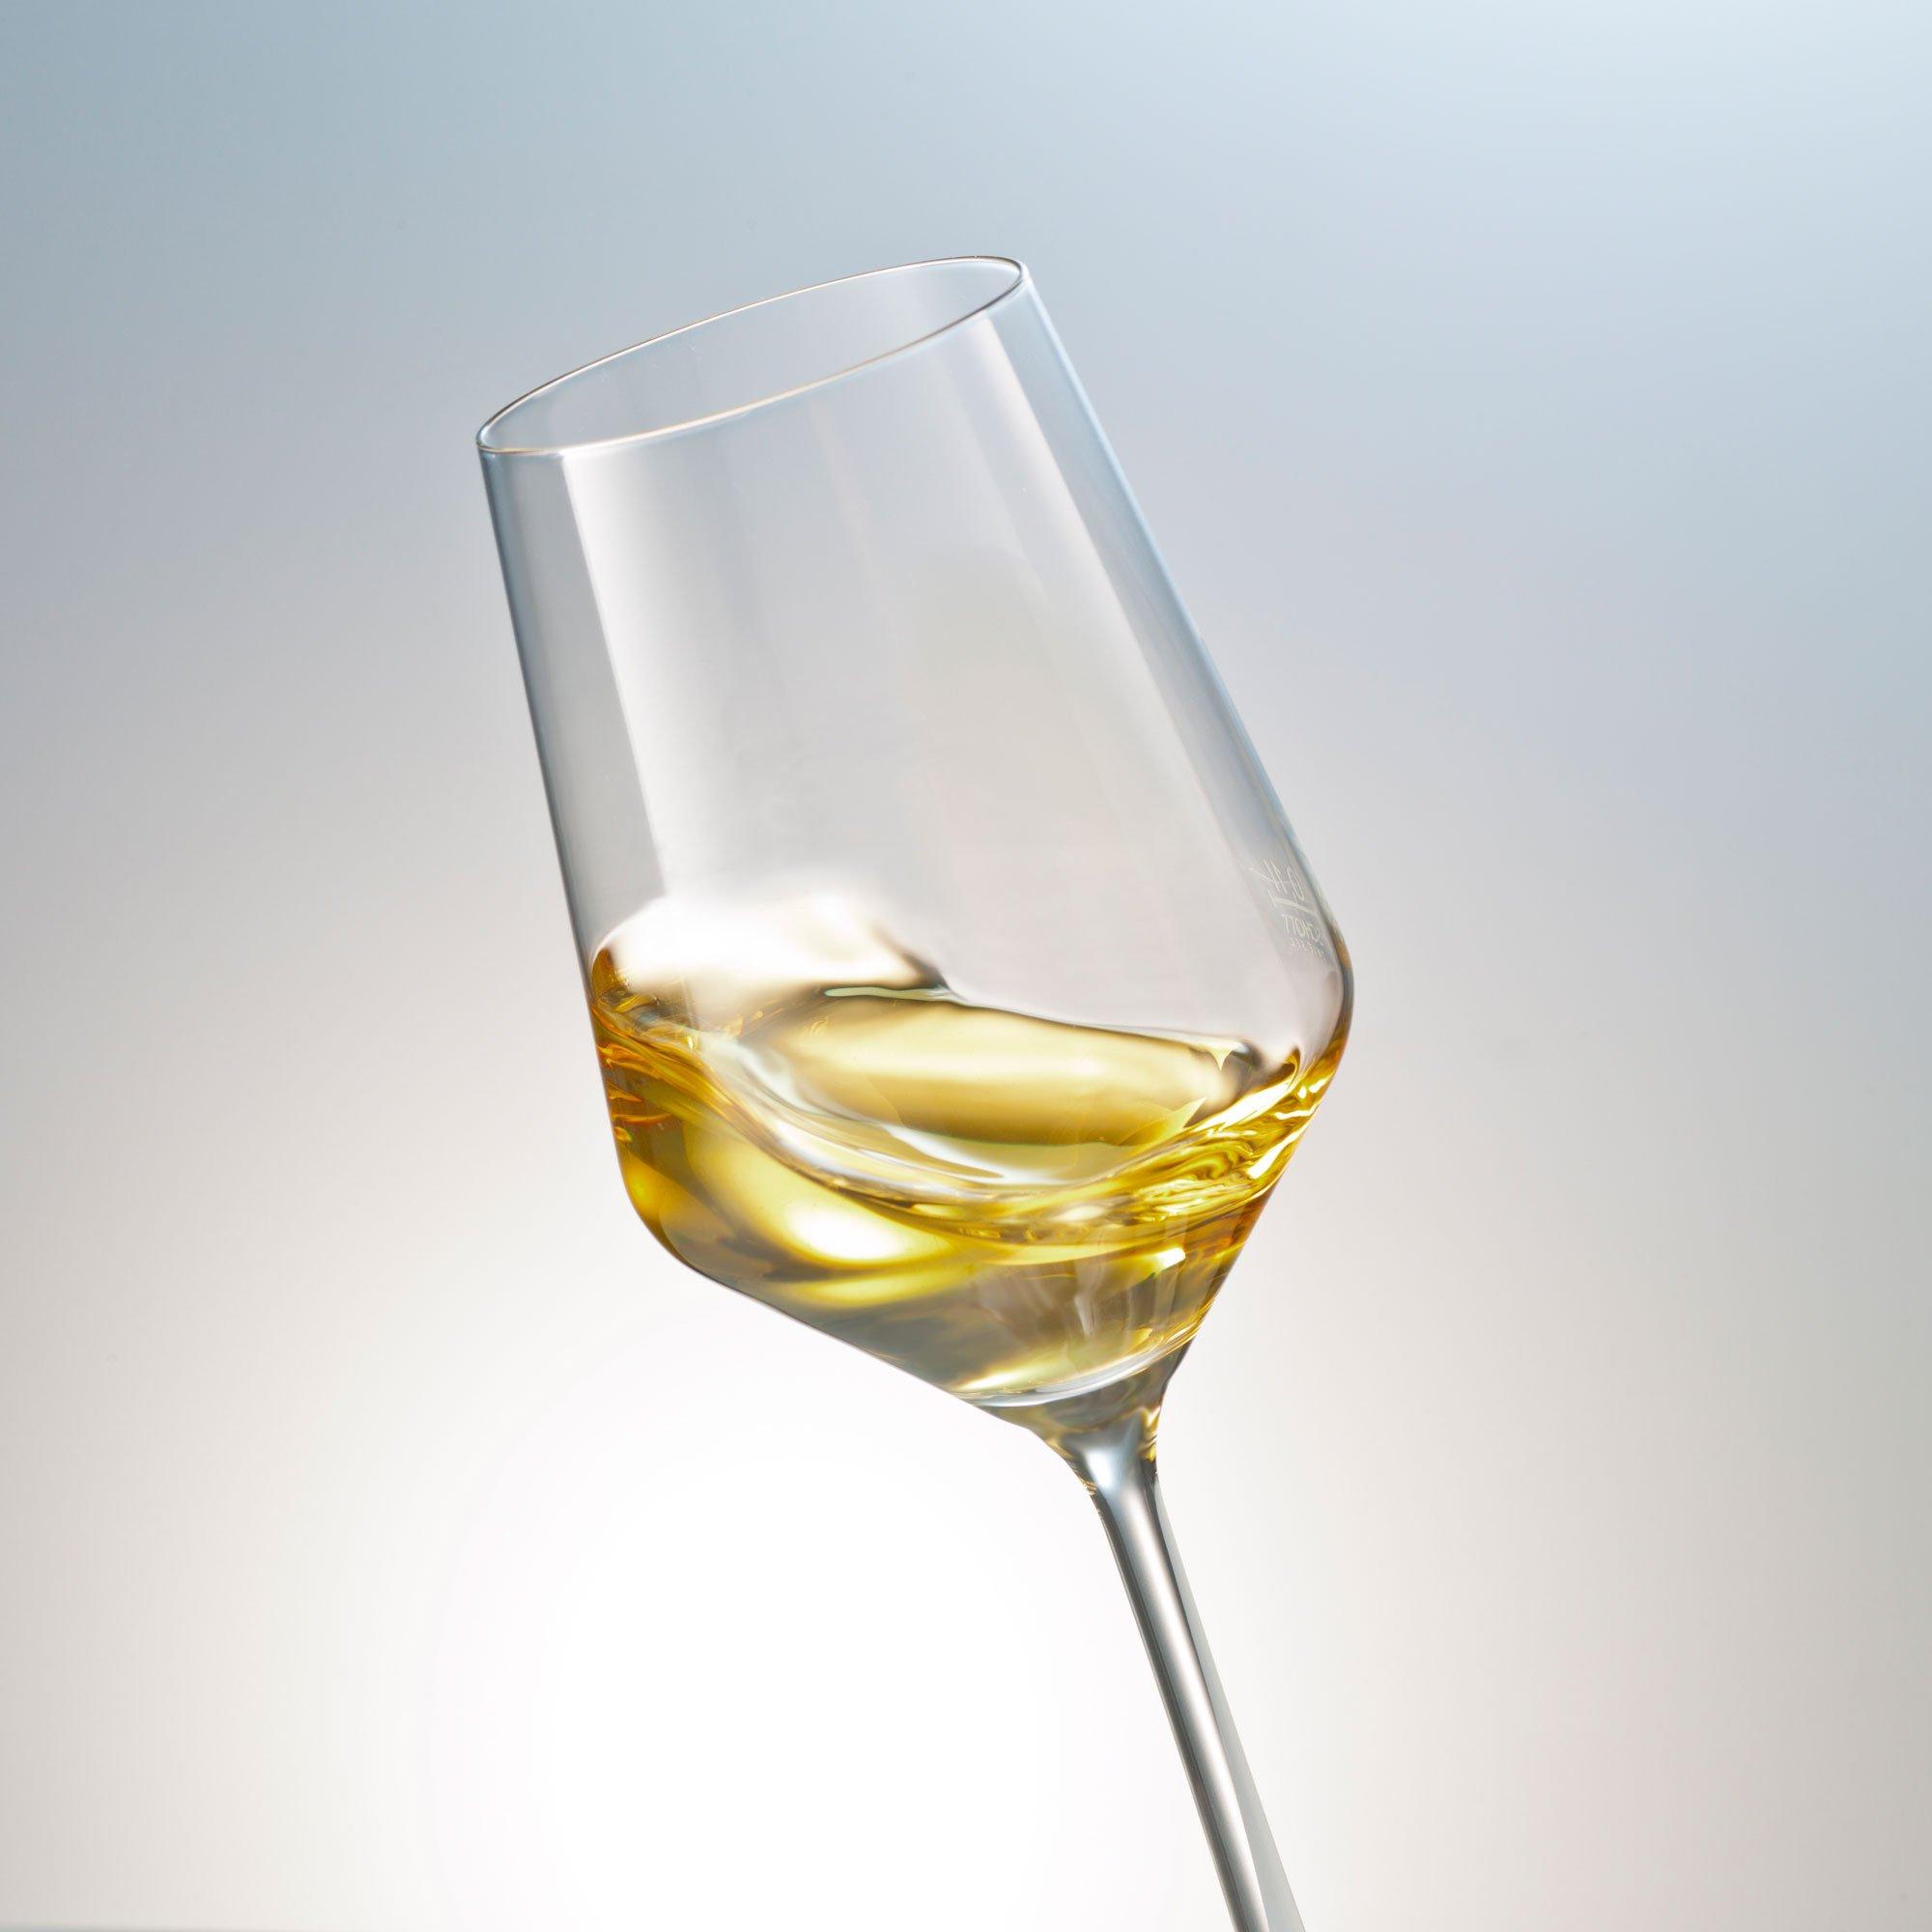 Schott Zwiesel Tritan Pure Sauvignon Blanc Glasses - Set of 6 by Schott Zwiesel (Image #2)